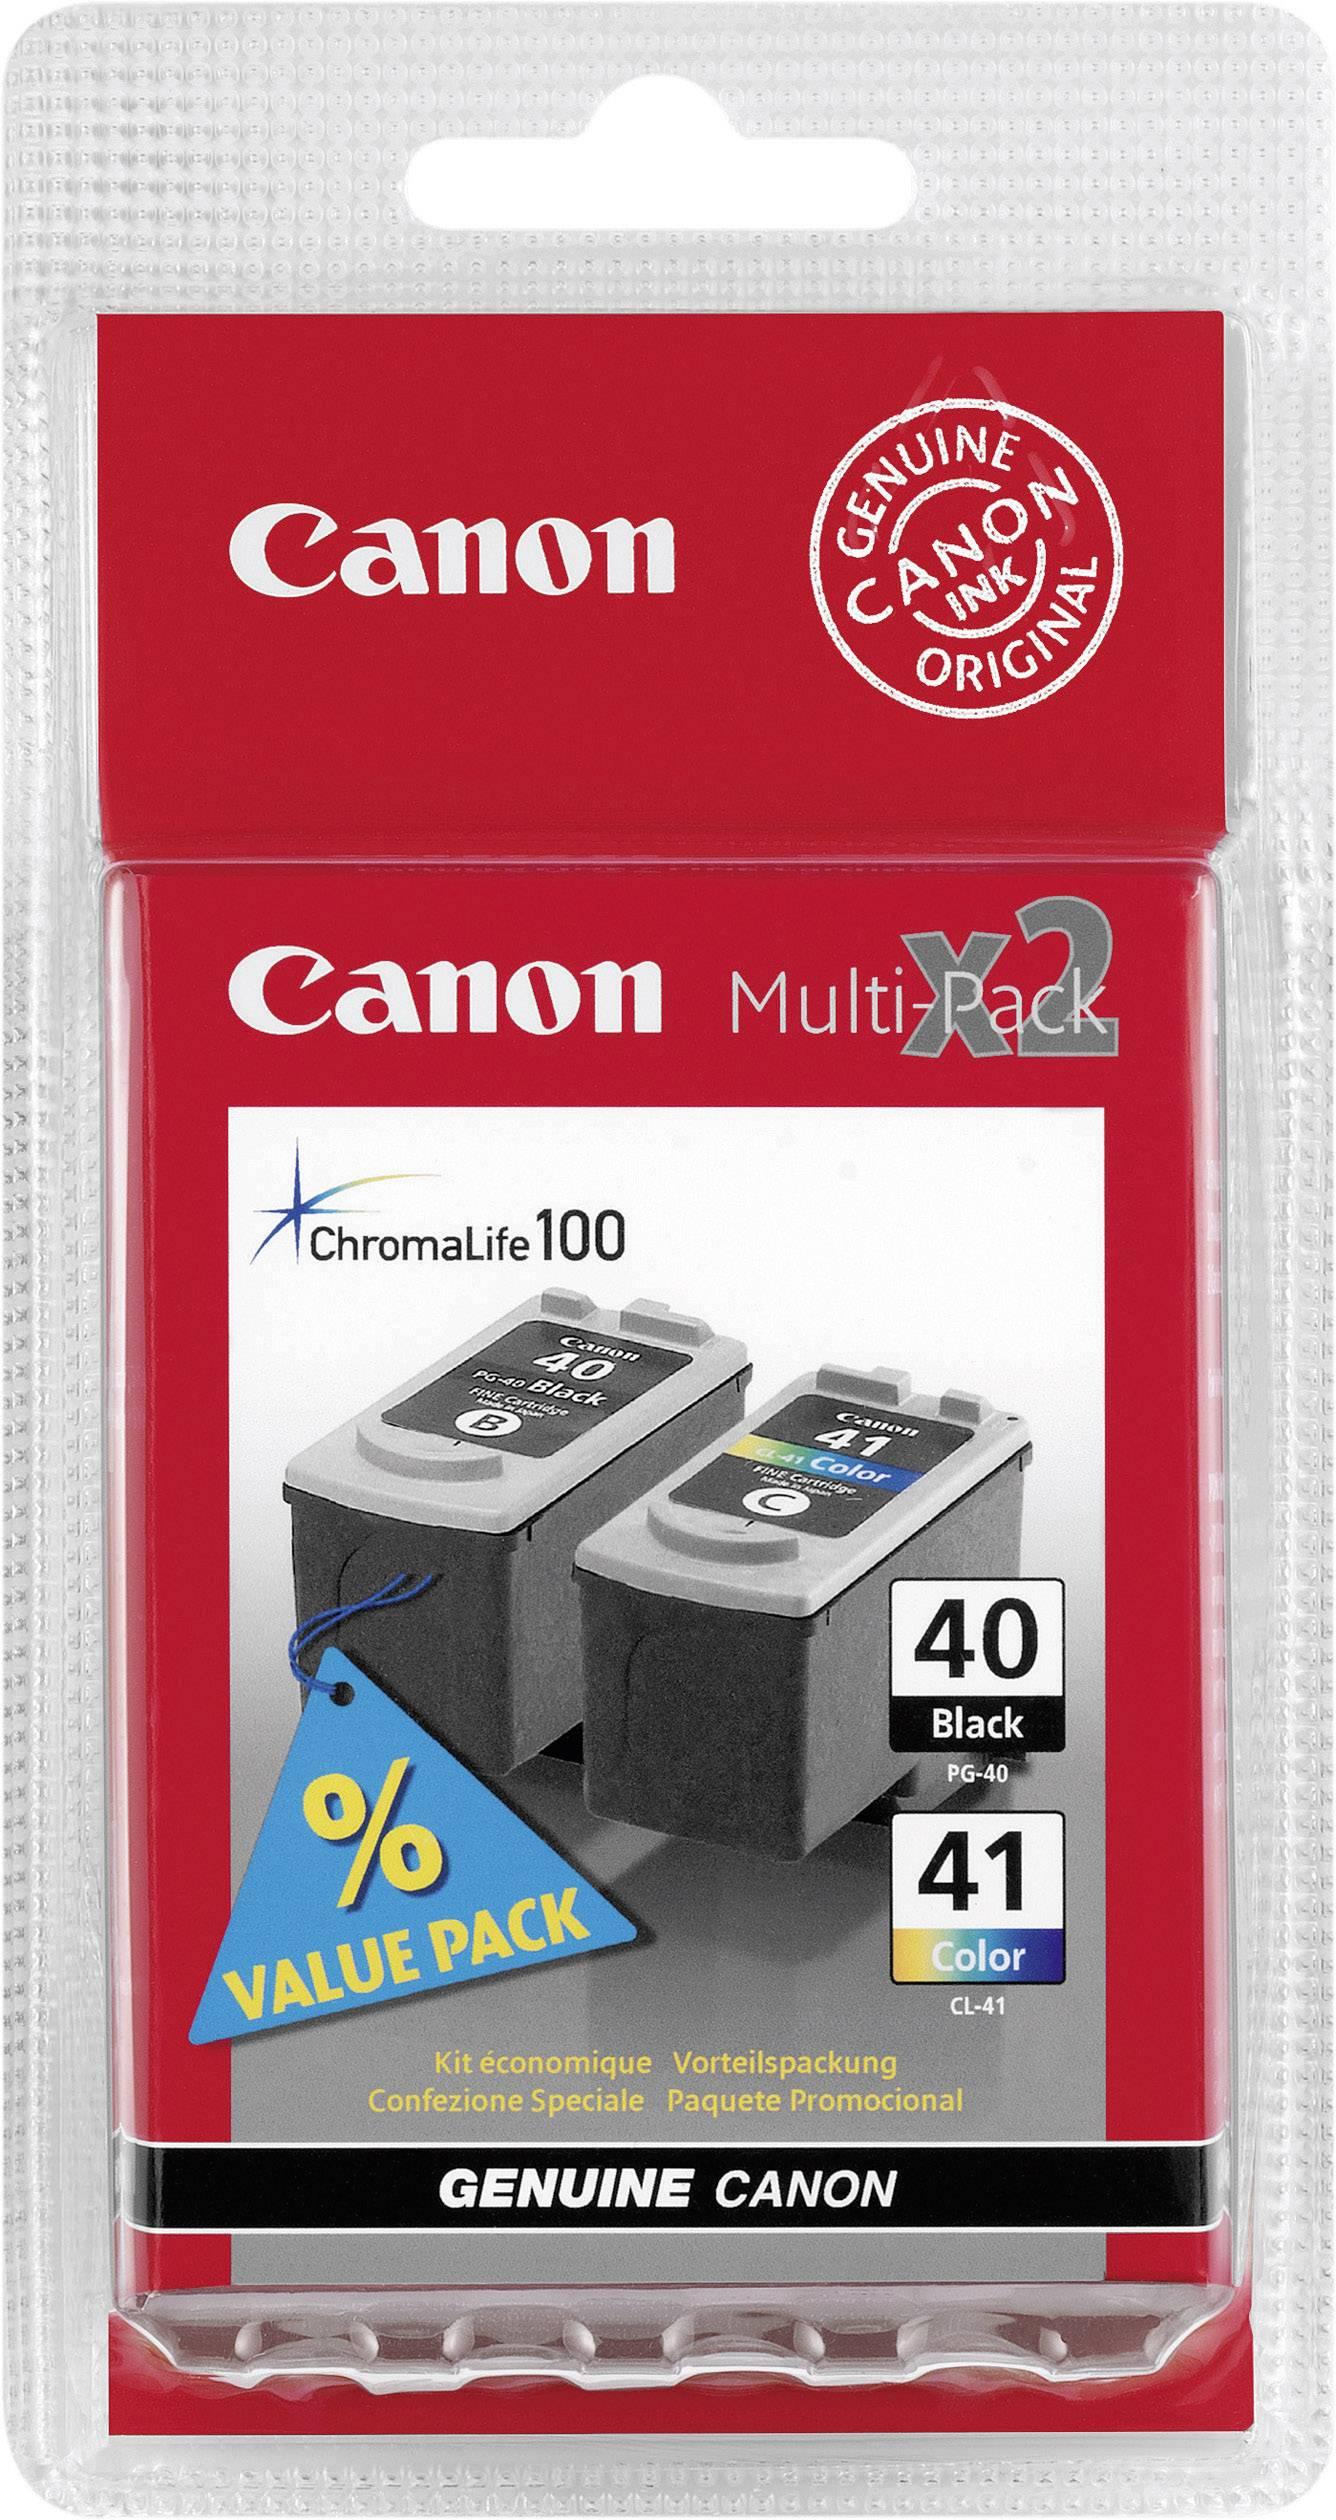 Blckpatron Value Pack Original Canon Pg 40 Cl 41 Kombi Svart Colour Cyan Magenta Gul